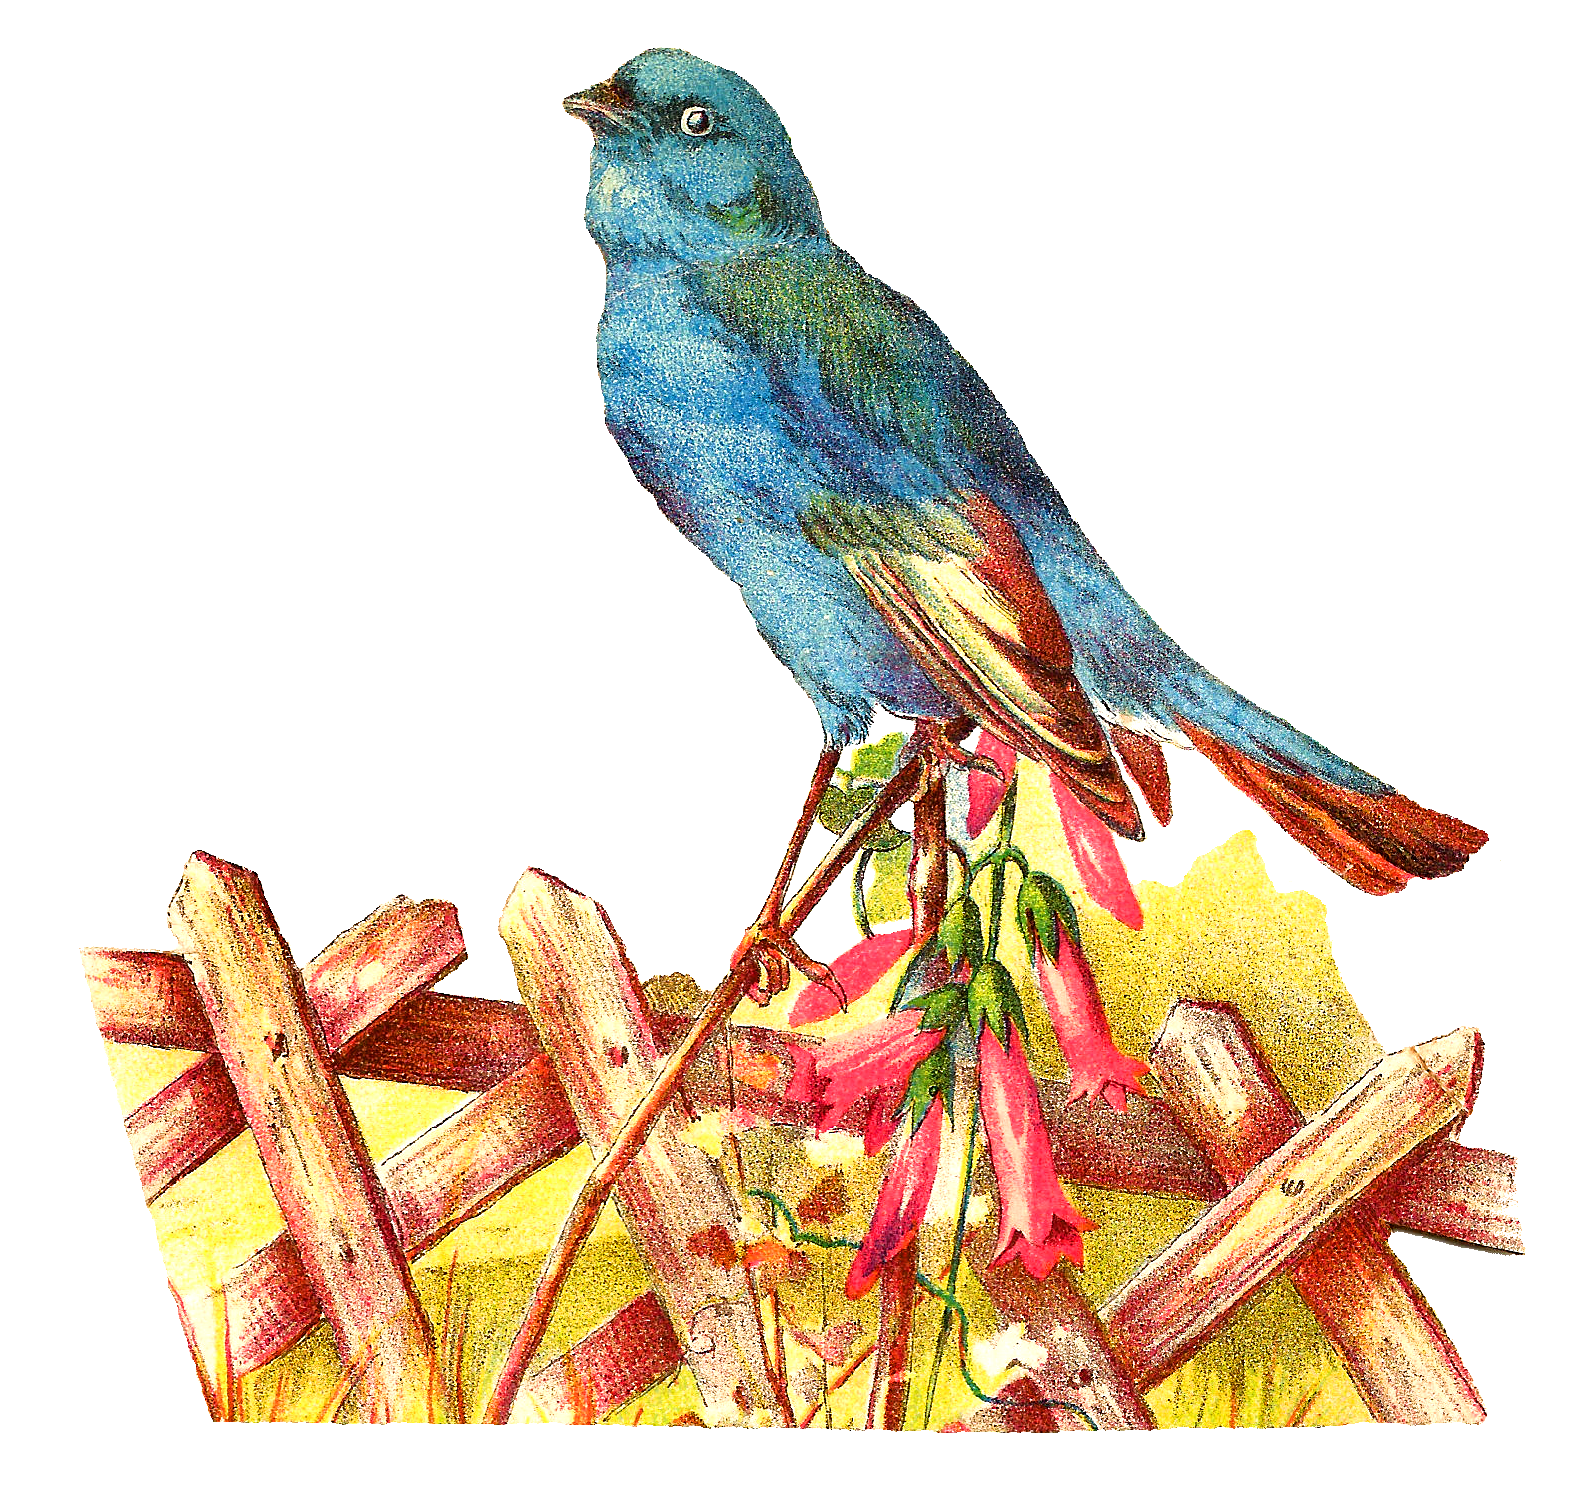 Pet clipart blue bird. Antique images november this